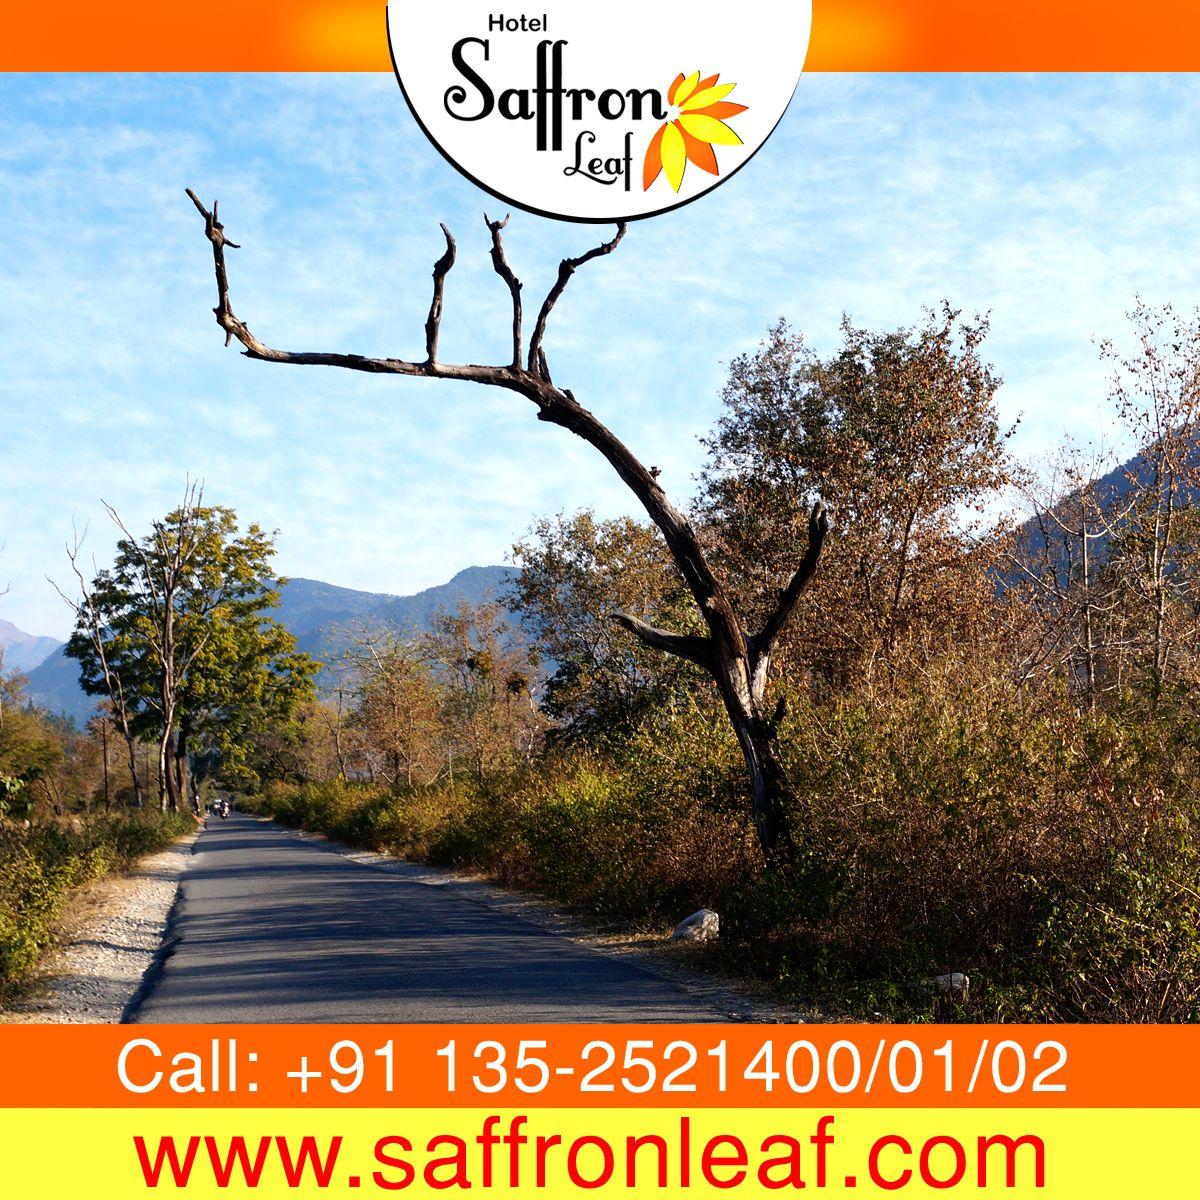 Spend your lovish time in Hotel Saffron Leaf and visit the beauty of Dehradun. To know more about us visit www.saffronleaf.com